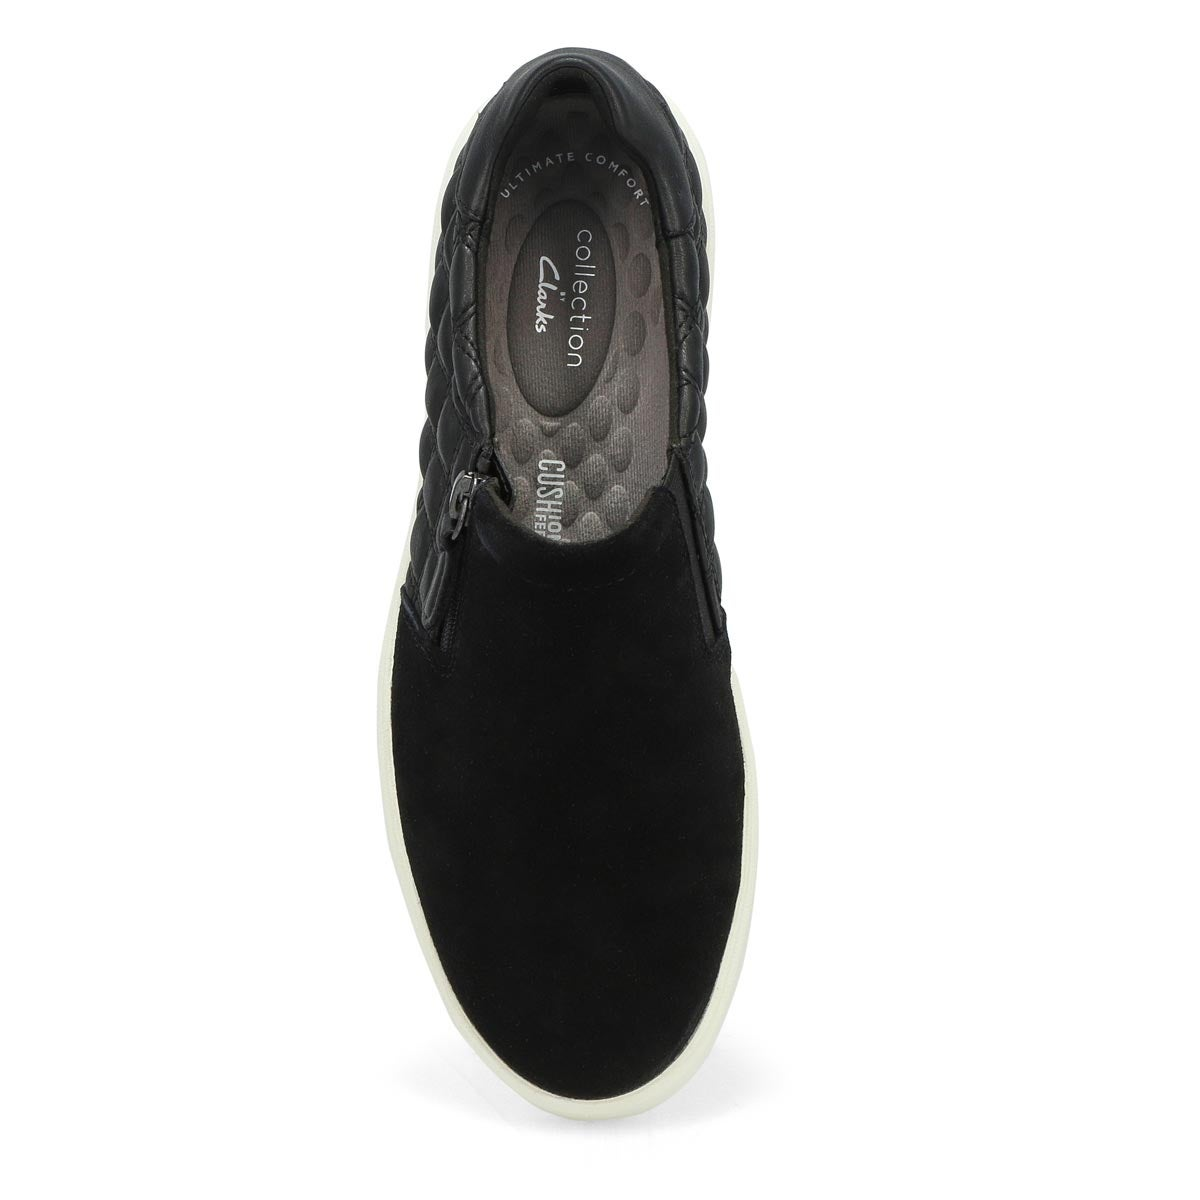 Chaussure Layton Step, noir, fem-Étroite